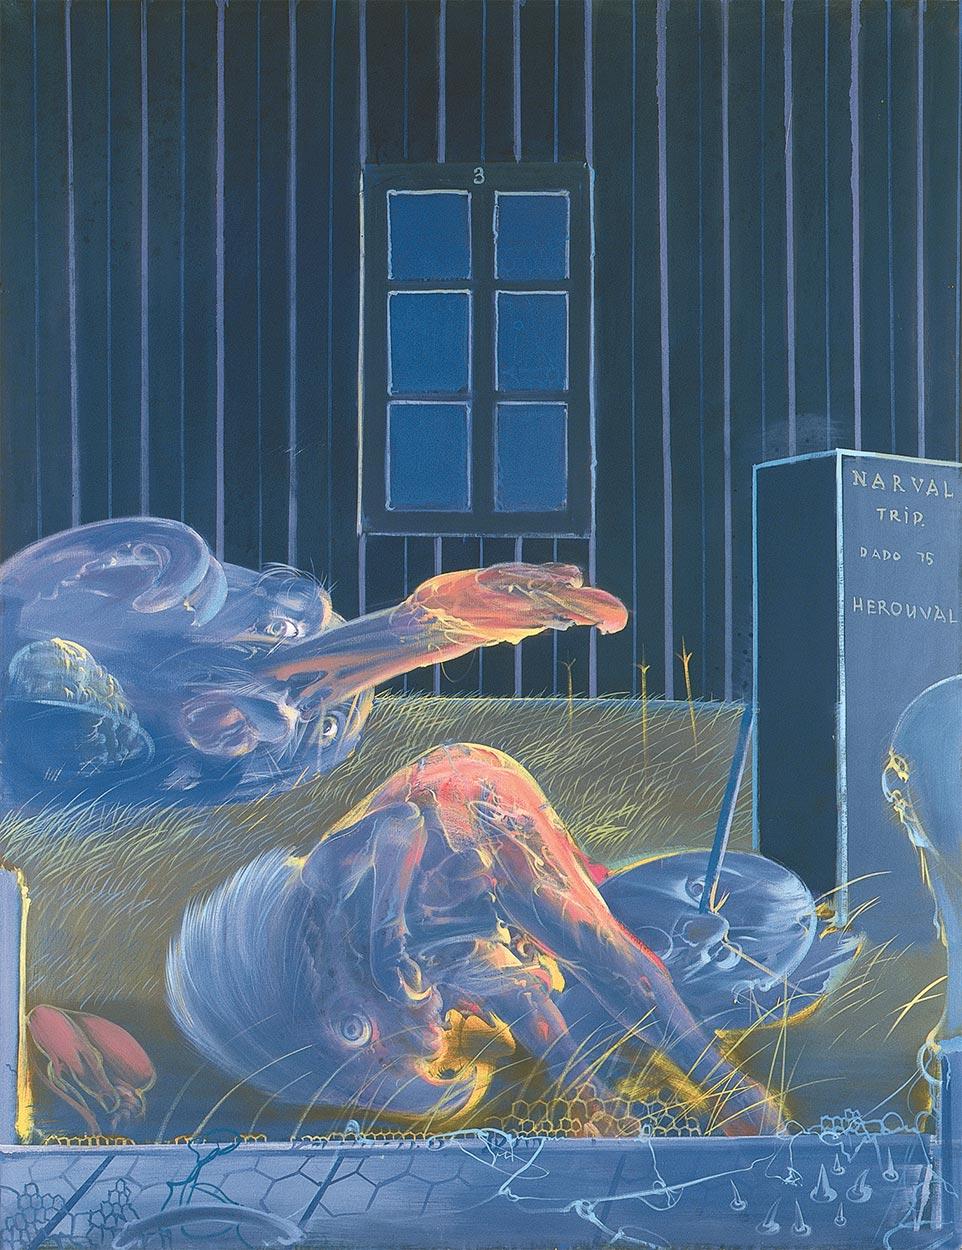 Dado: Narval Triptych, 1975